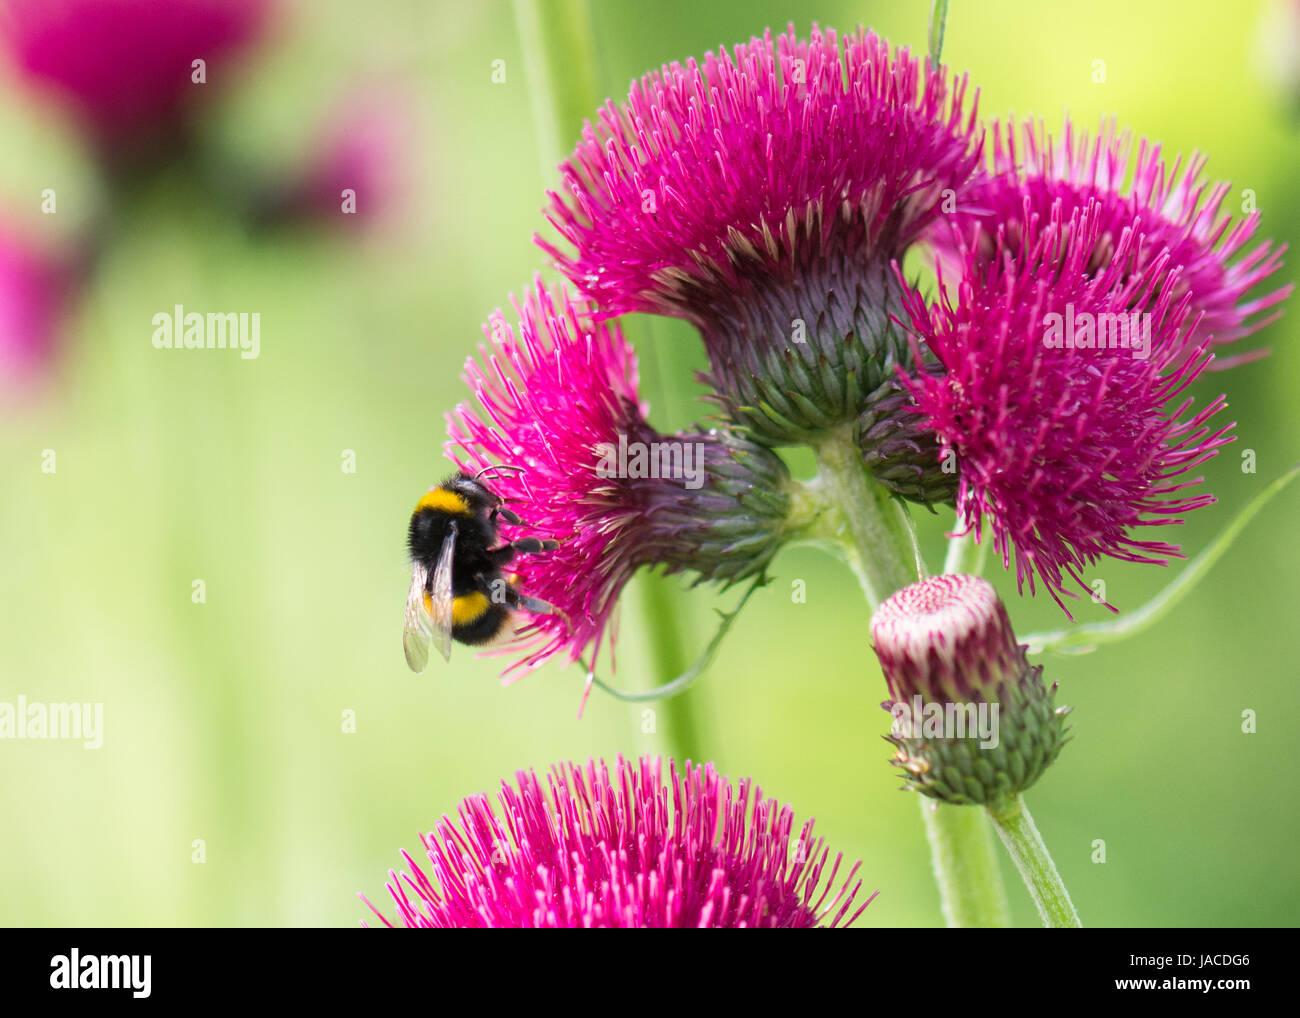 Bombus terrestris - buff tailed bumblebee - on cirsium rivulare atropurpureum deep pink flower - Stock Image